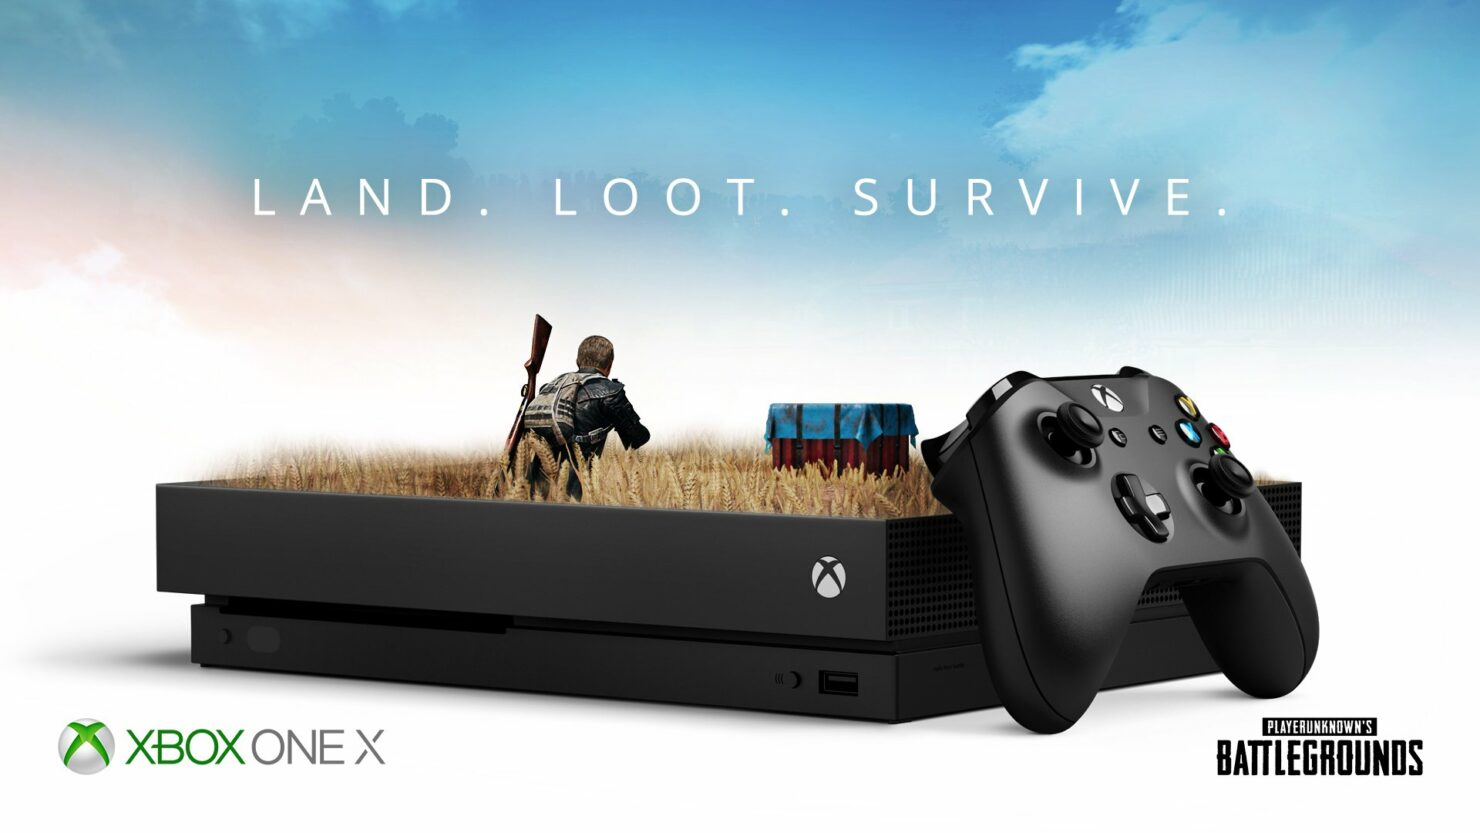 PUBG Xbox One 1.0 update